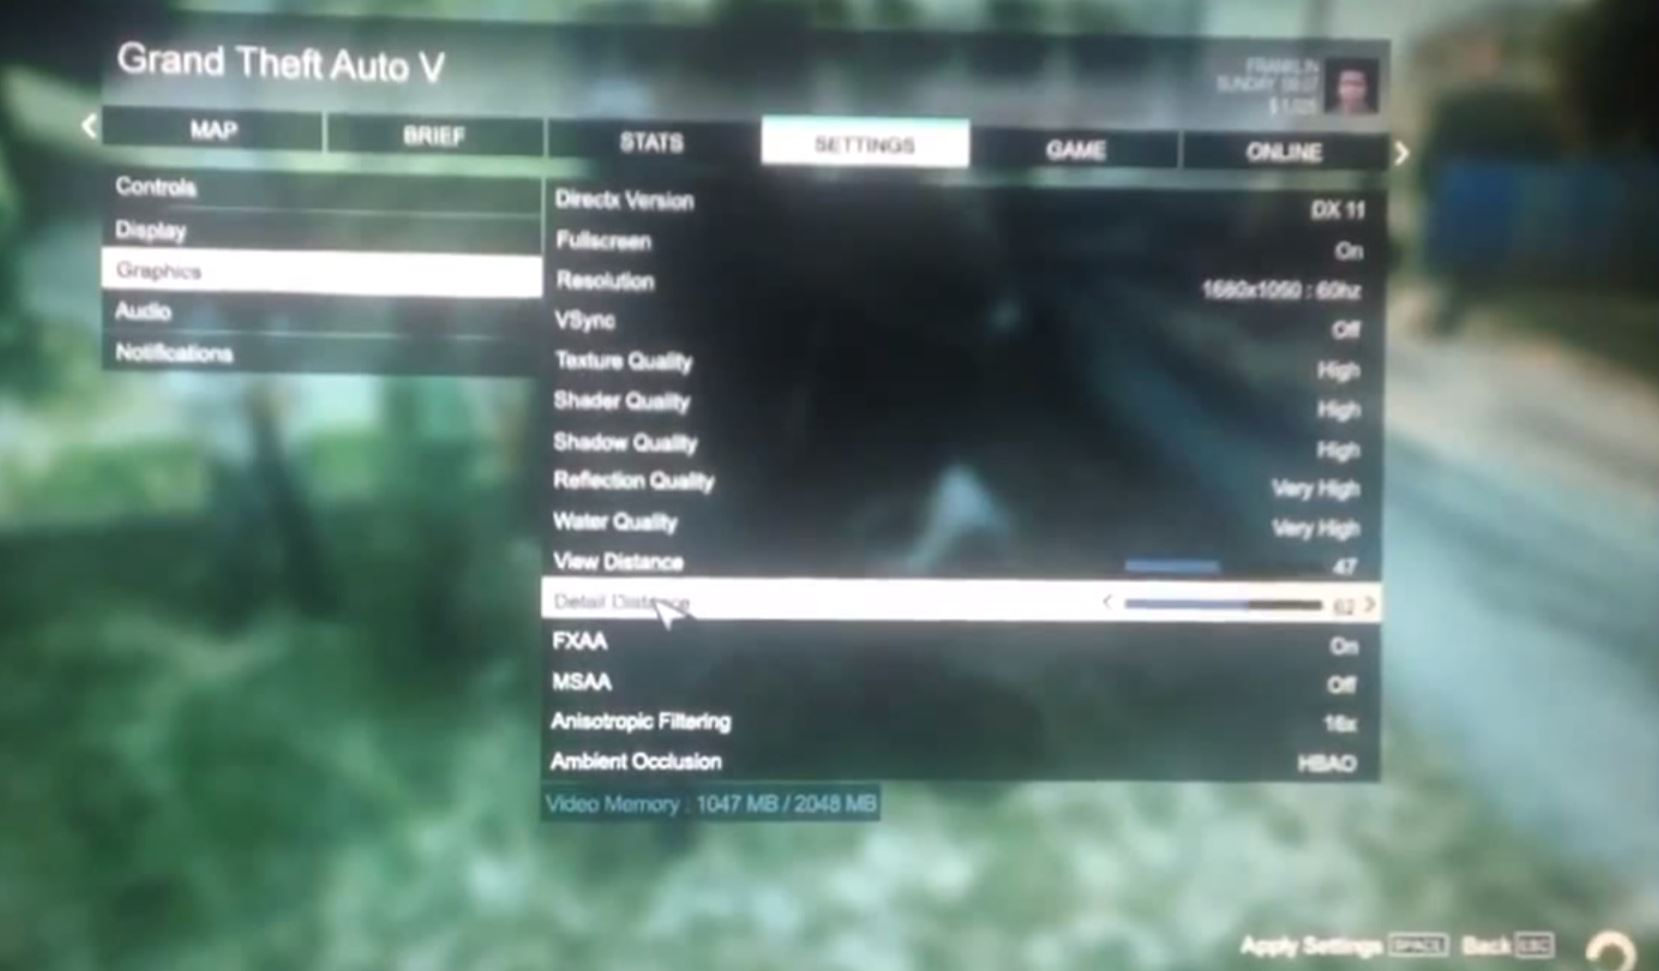 GTA 5 PC Gameplay Footage Fake? - Guardian Liberty Voice